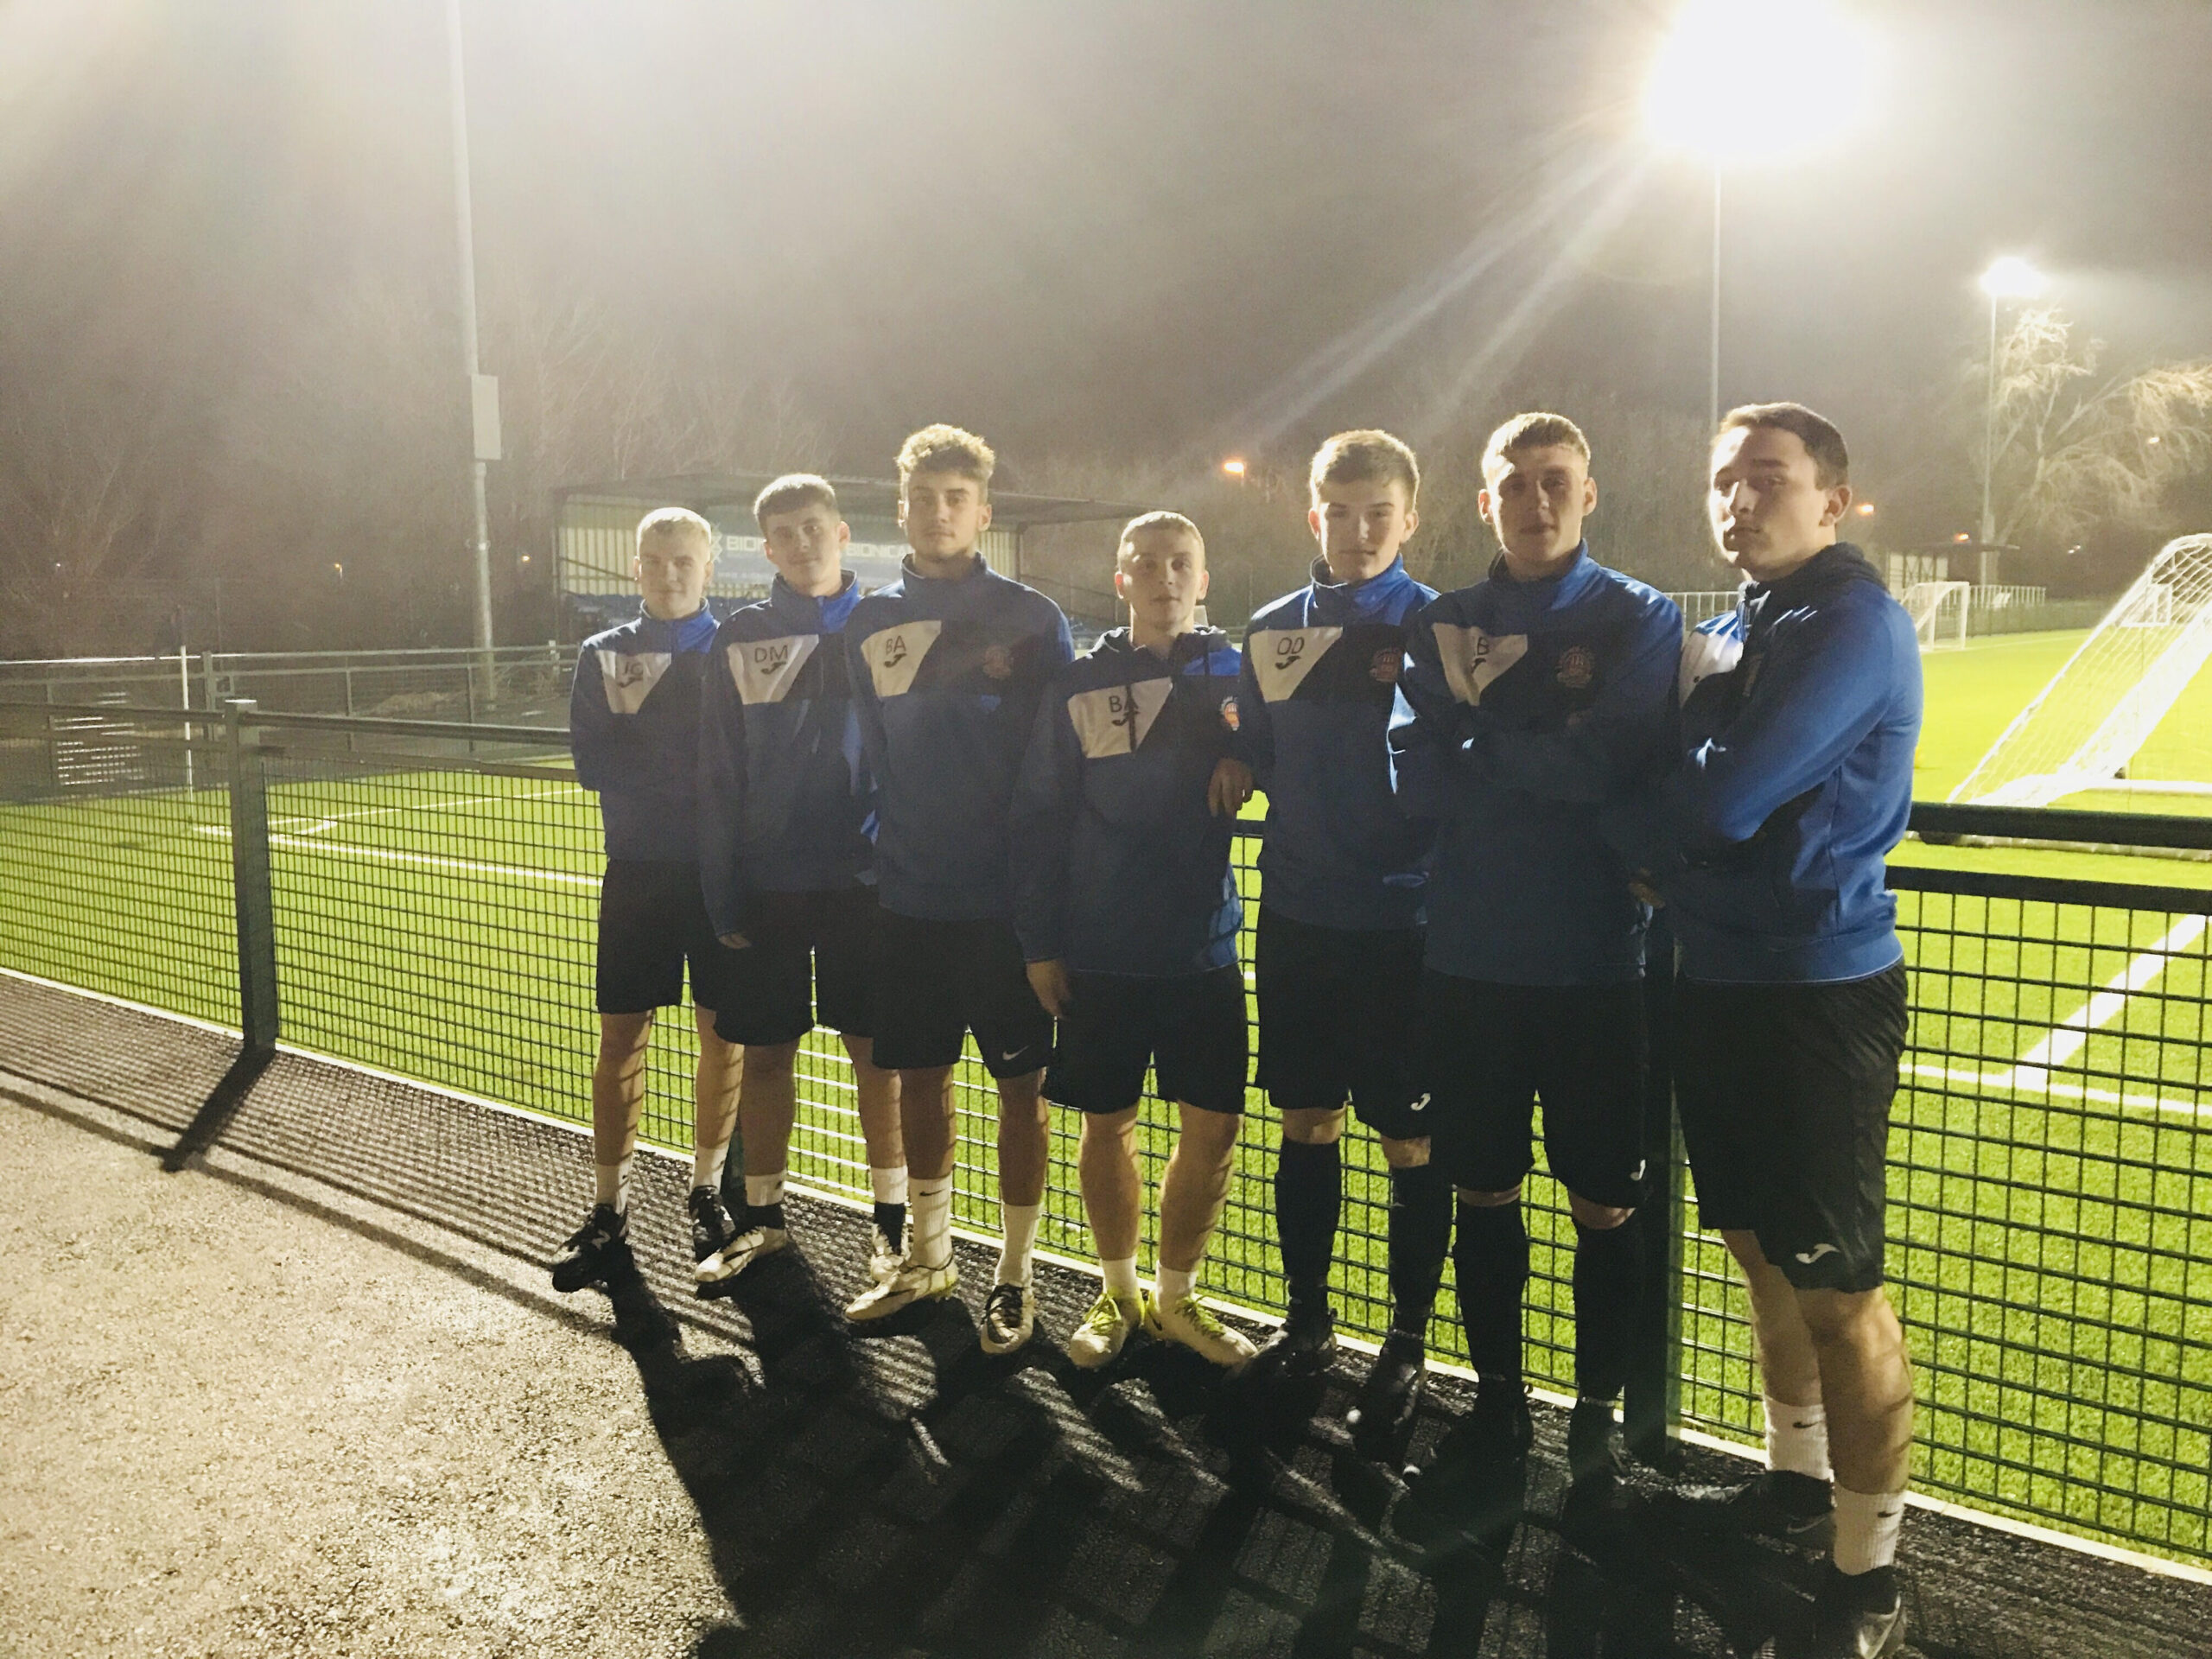 Lichfield City Academy 1st teamers